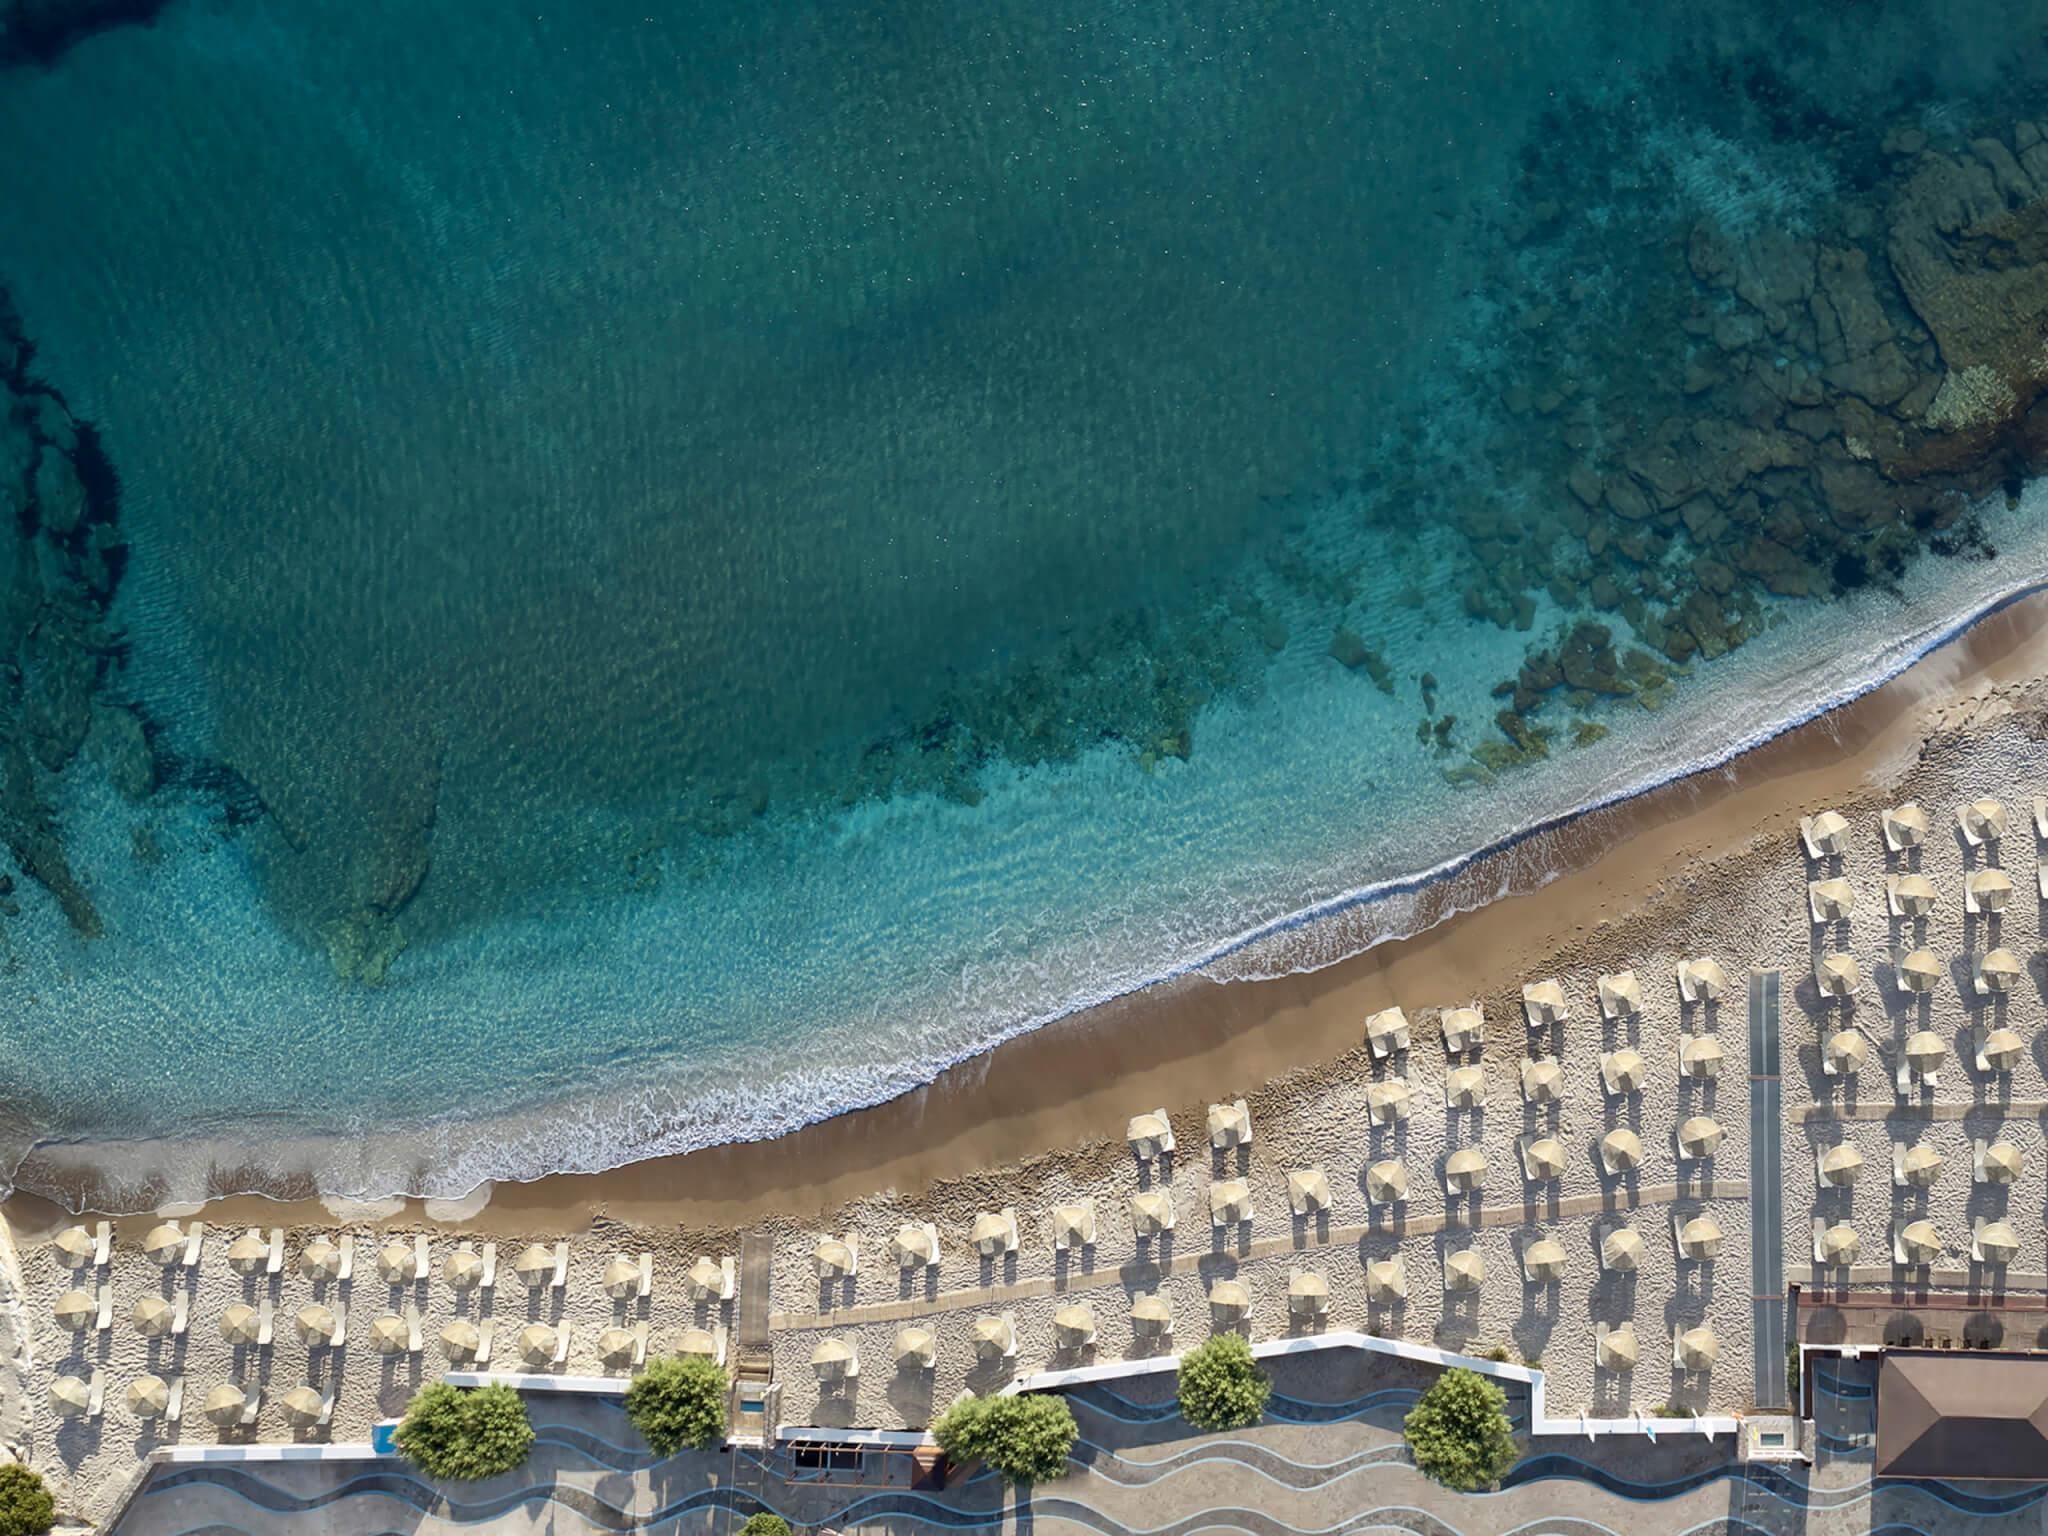 Griechenland-urlaub-famliien-hotel-kreta-Creta-Maris-Beach-familienurlaub-planen-strand